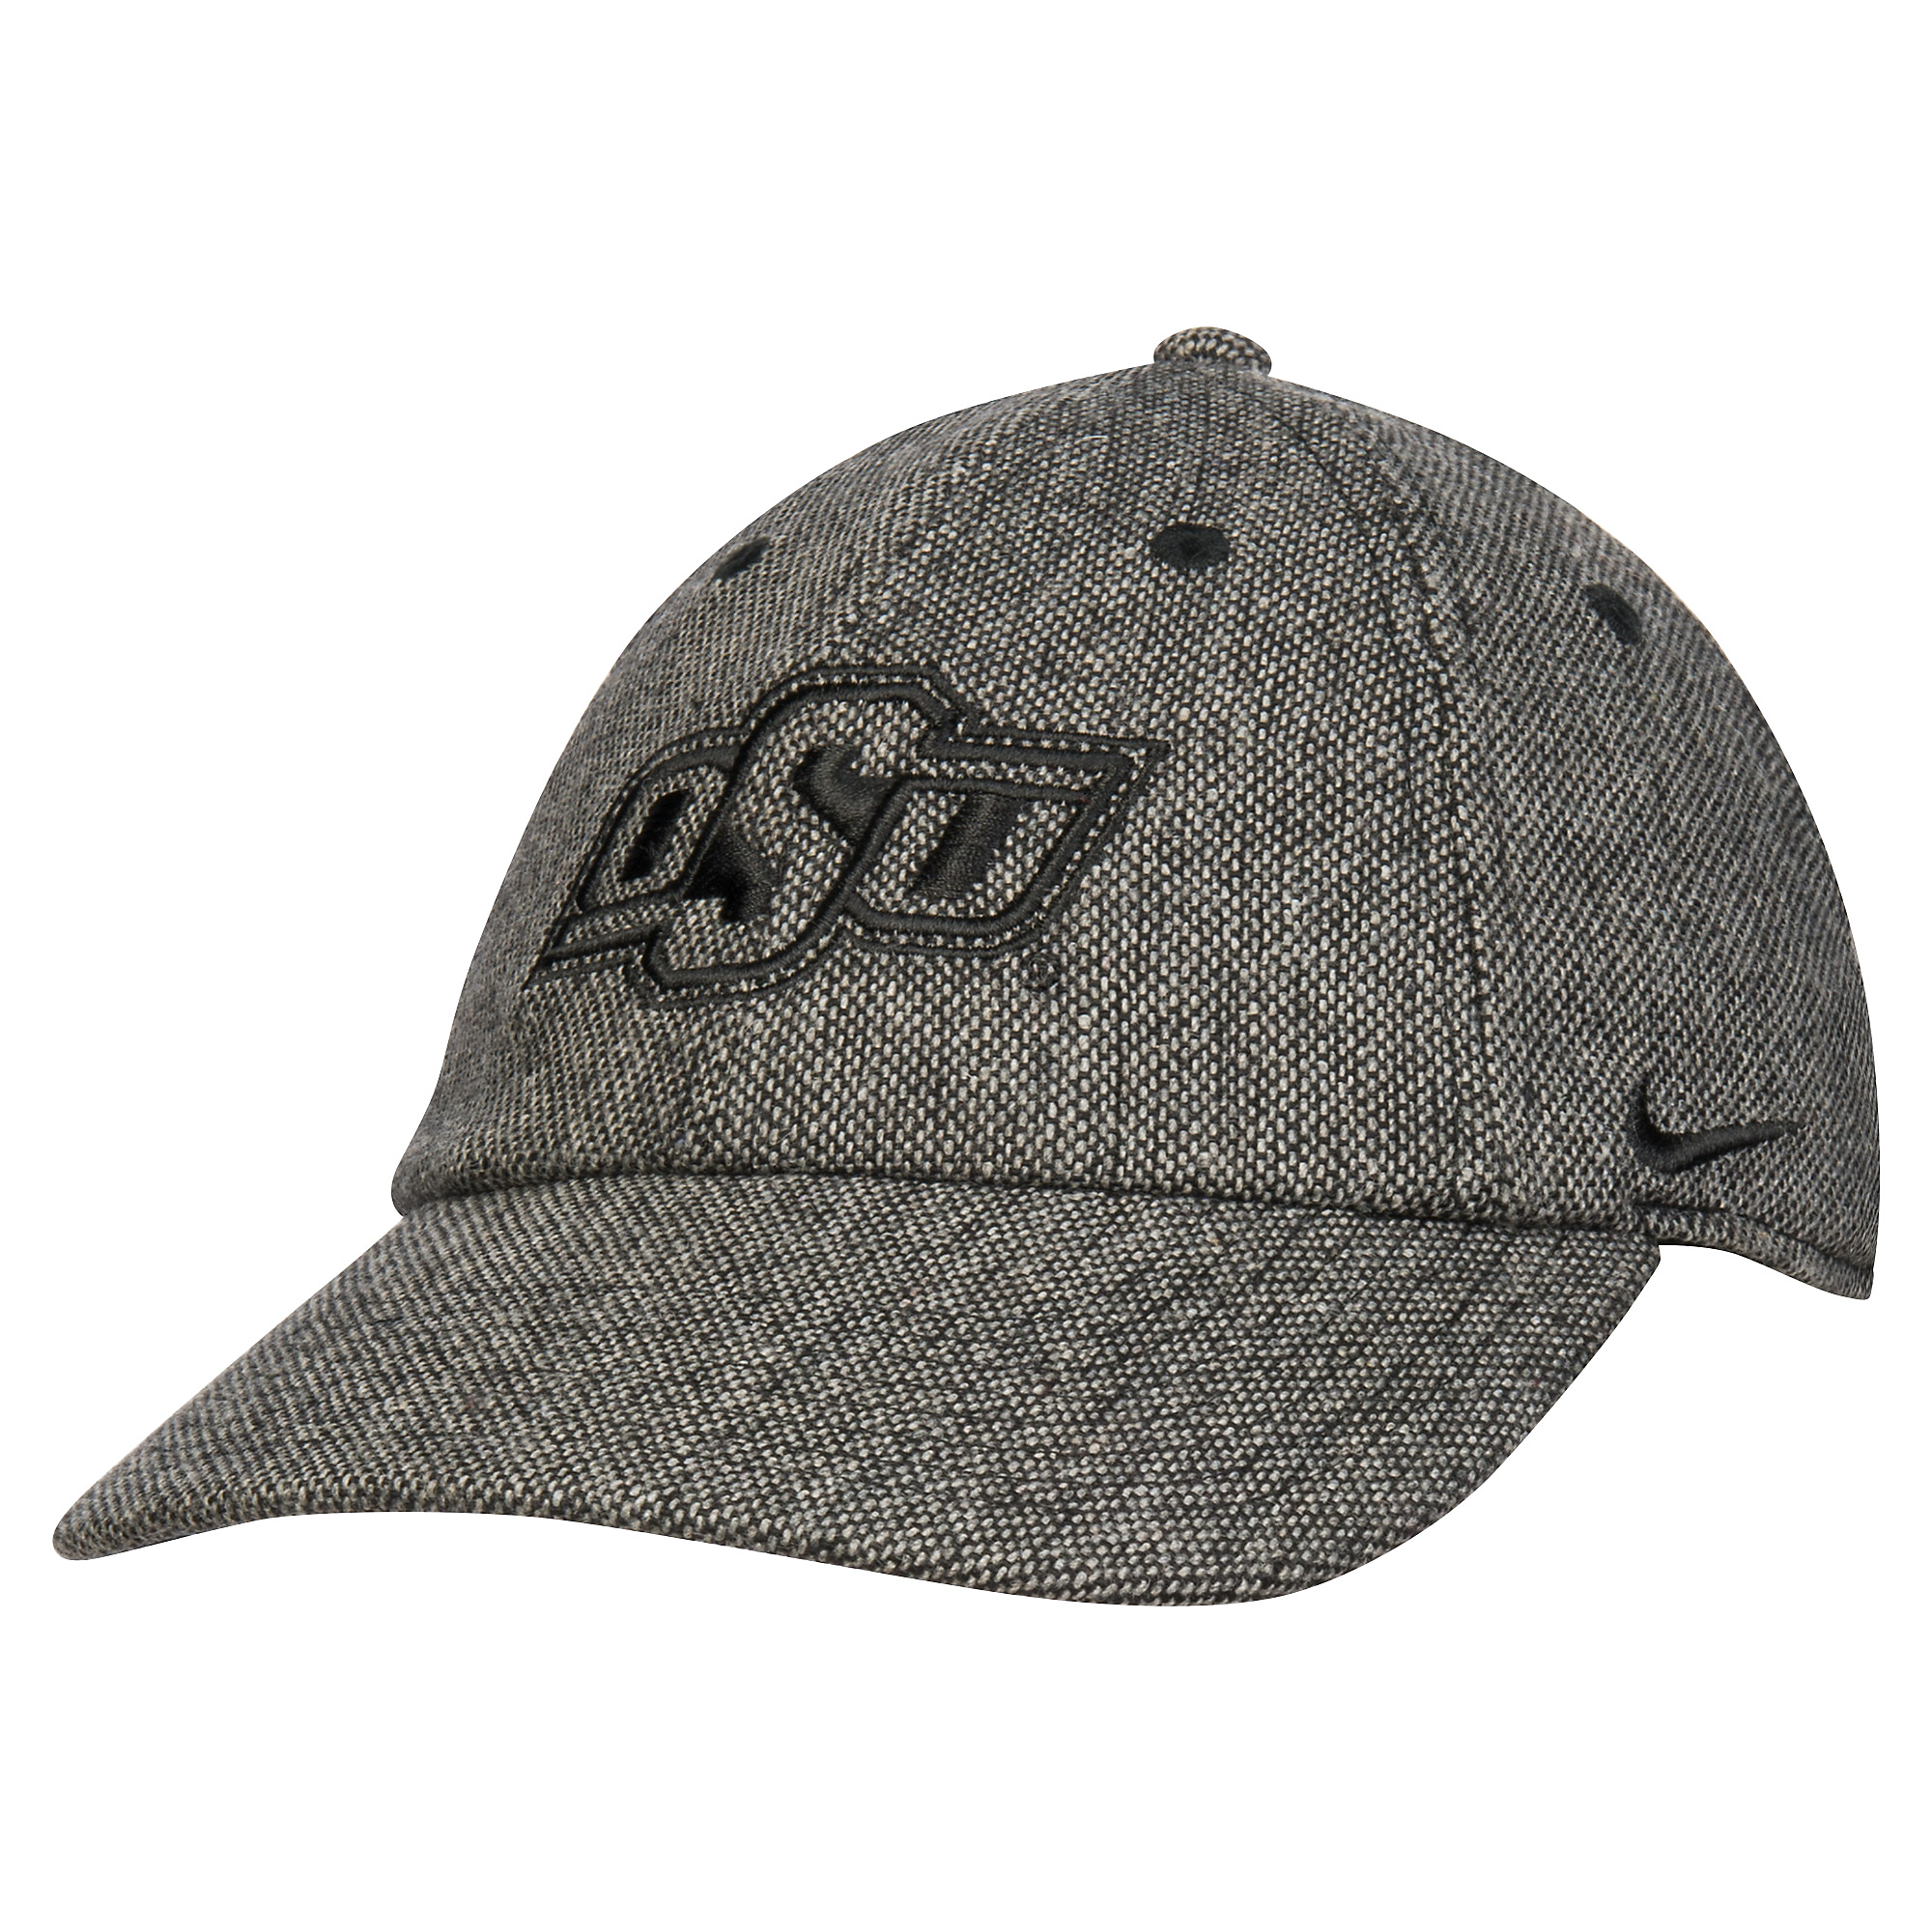 3cf9d6a01 Oklahoma State Cowboys Nike Heritage 86 Seasonal Adjustable Cap ...